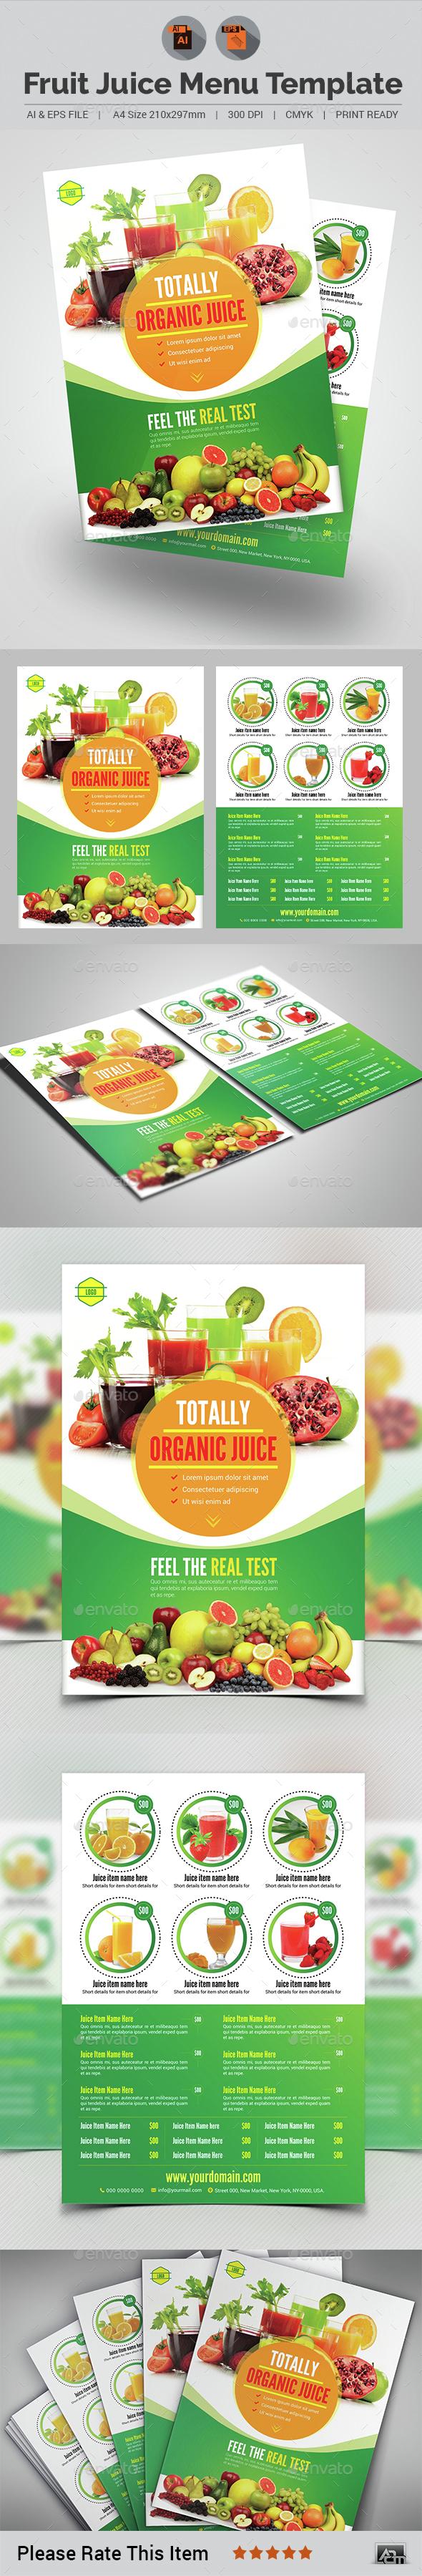 Fruit Juice Menu Template - Food Menus Print Templates